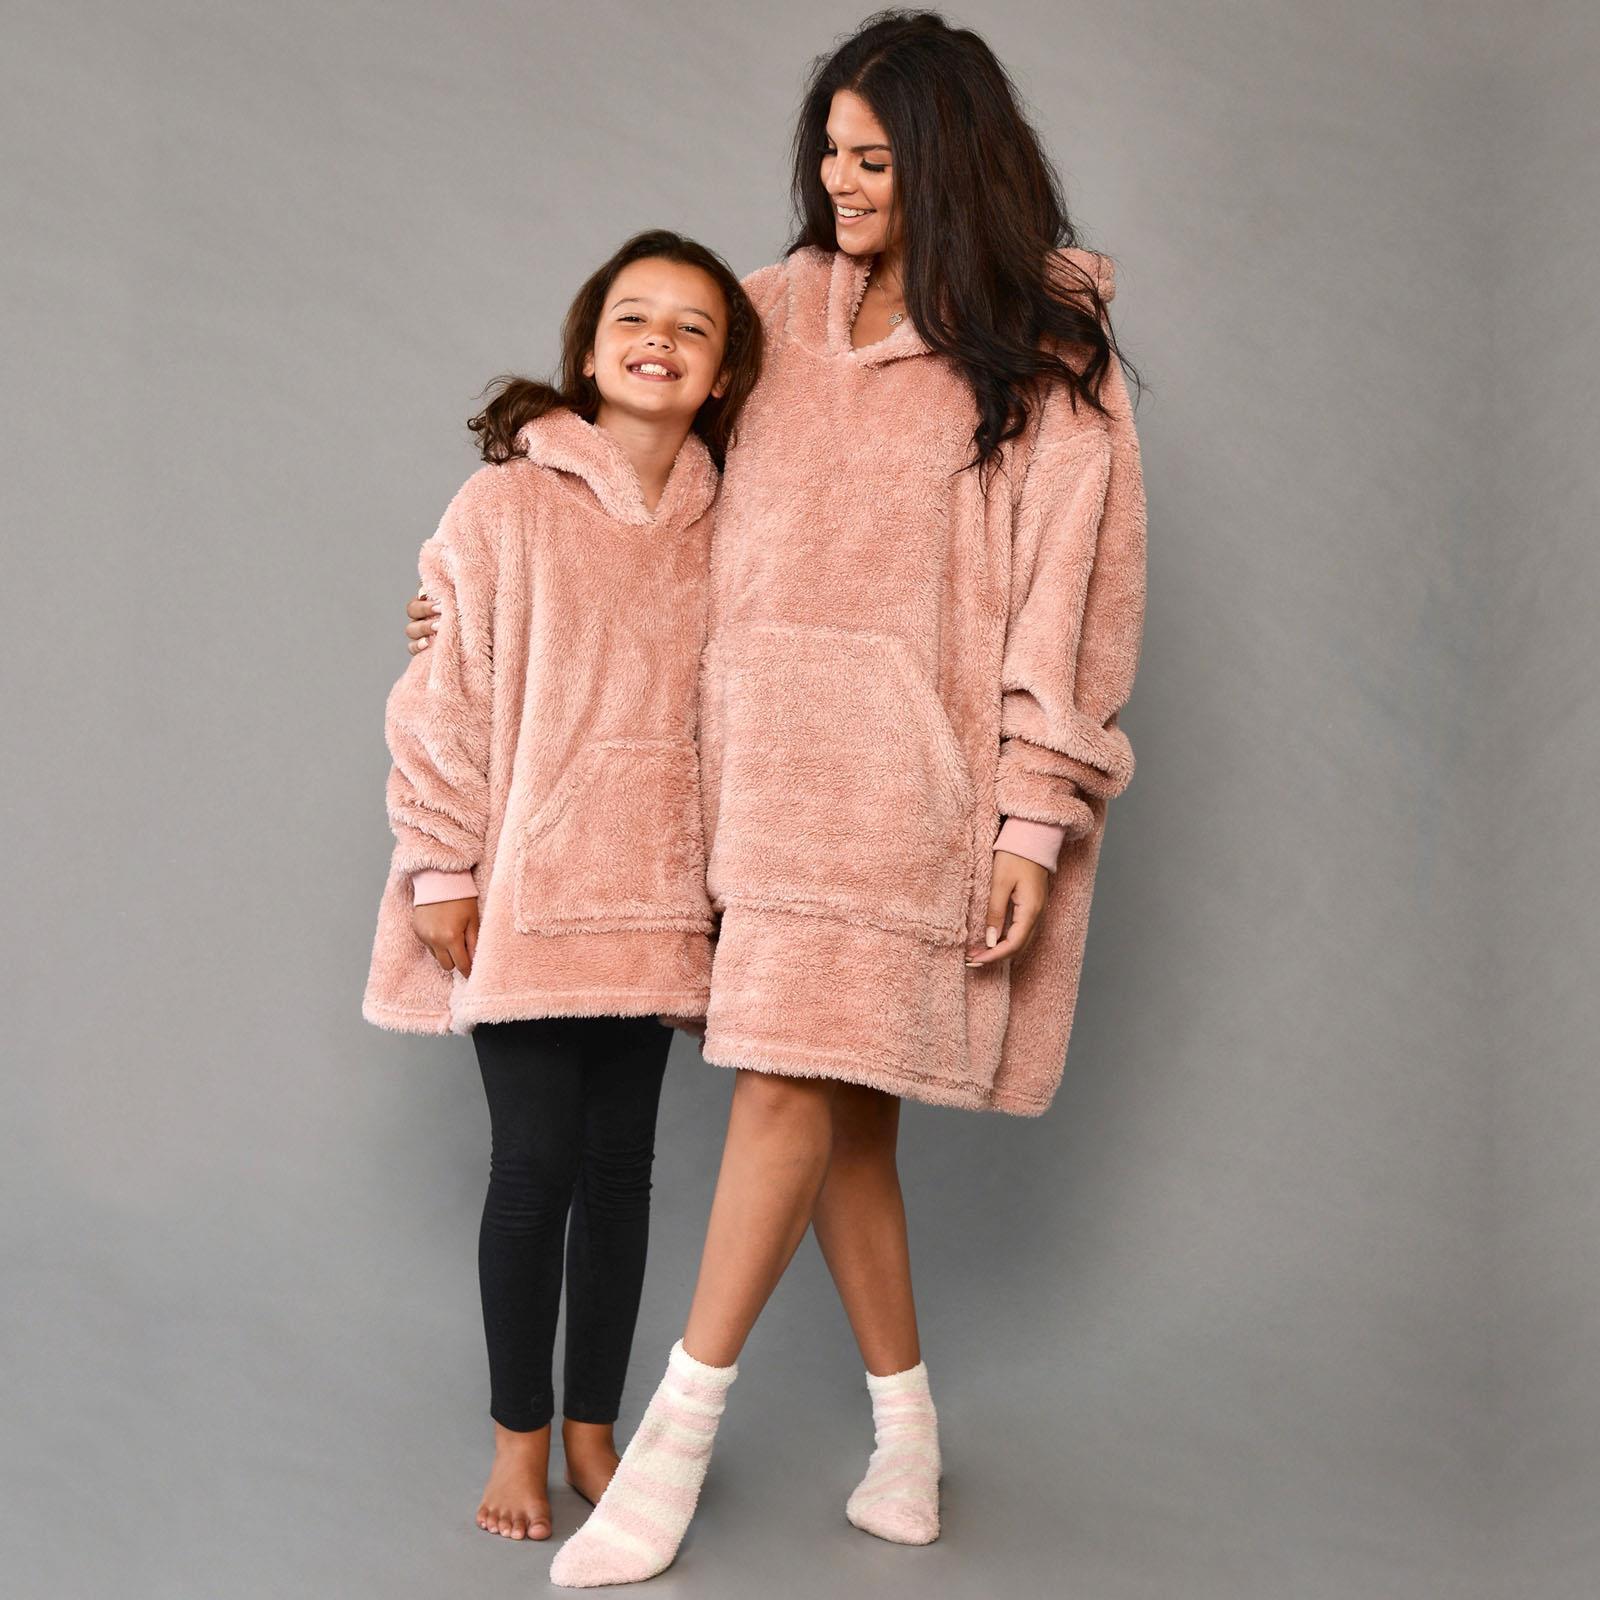 thumbnail 12 - Brentfords-Teddy-Fleece-Hoodie-Blanket-Oversized-Giant-Wearable-Adults-Kids-UK